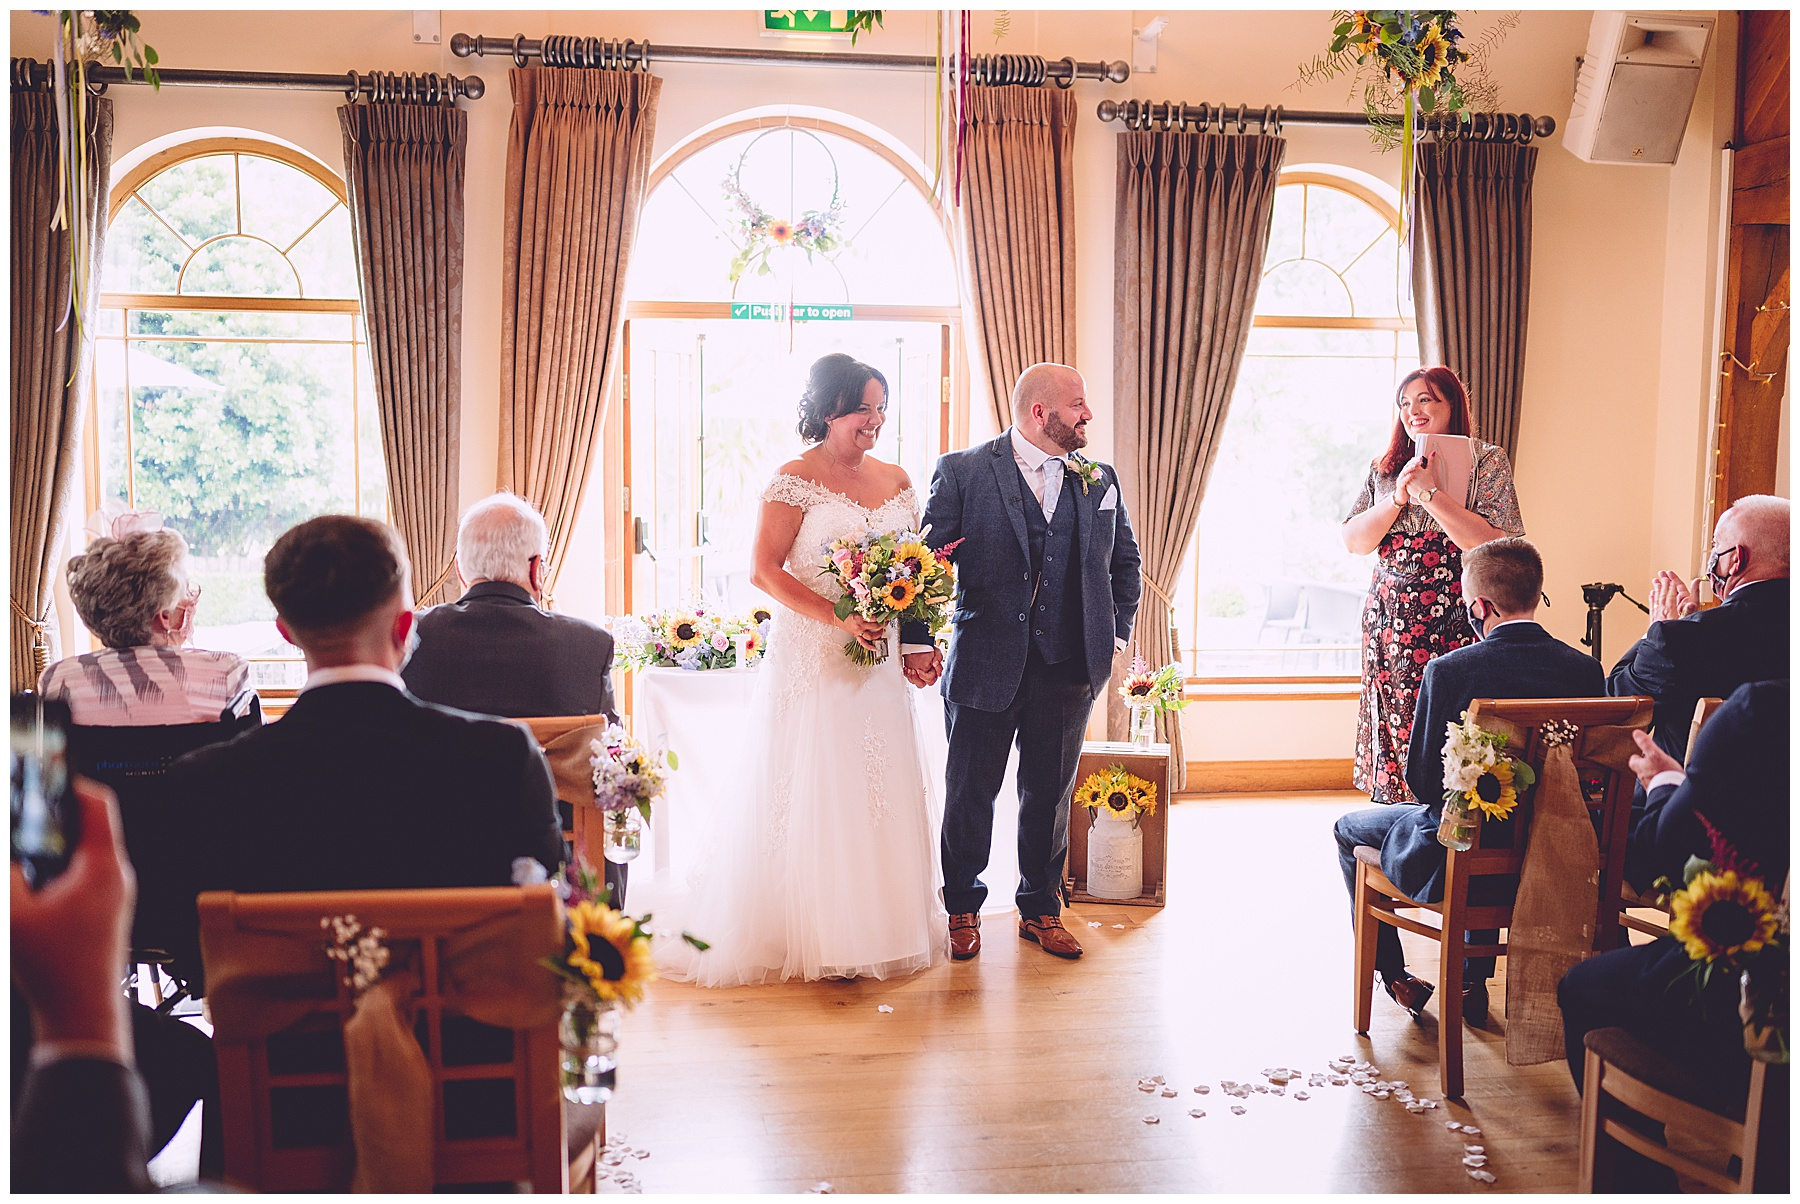 Wedding at King Arthur Hotel